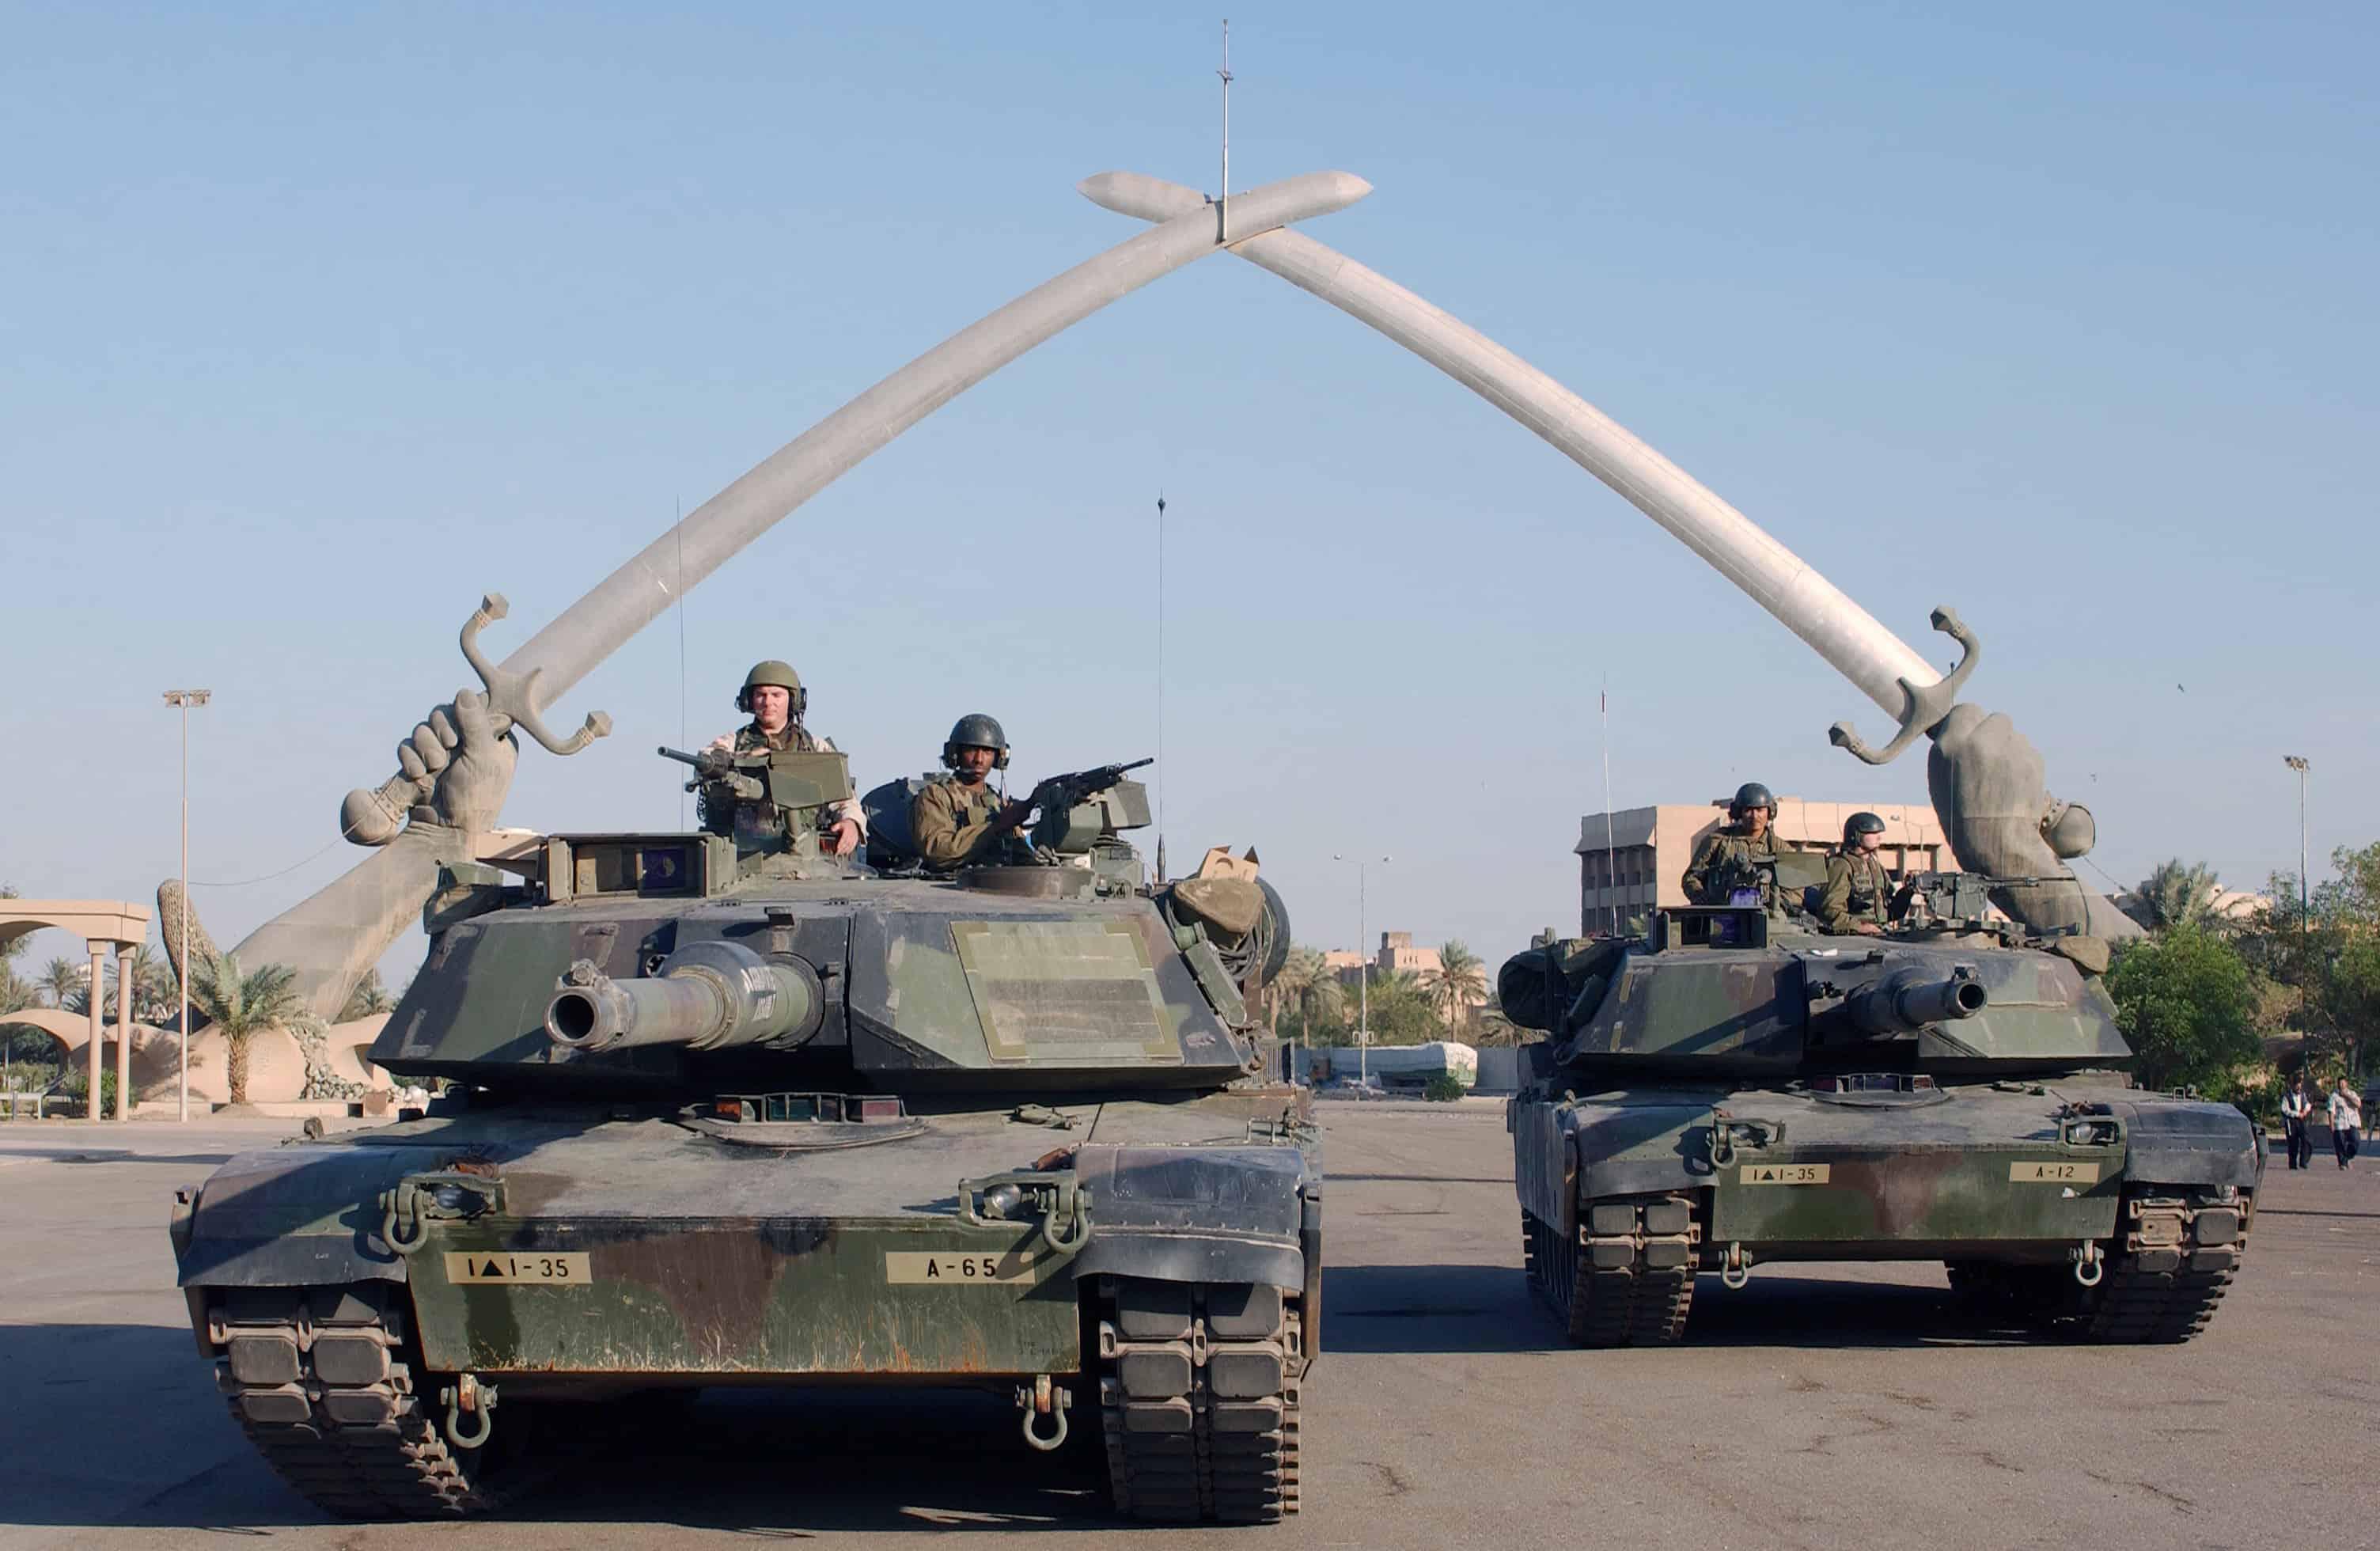 2004; HANDS OF VICTORY BAGHDAD